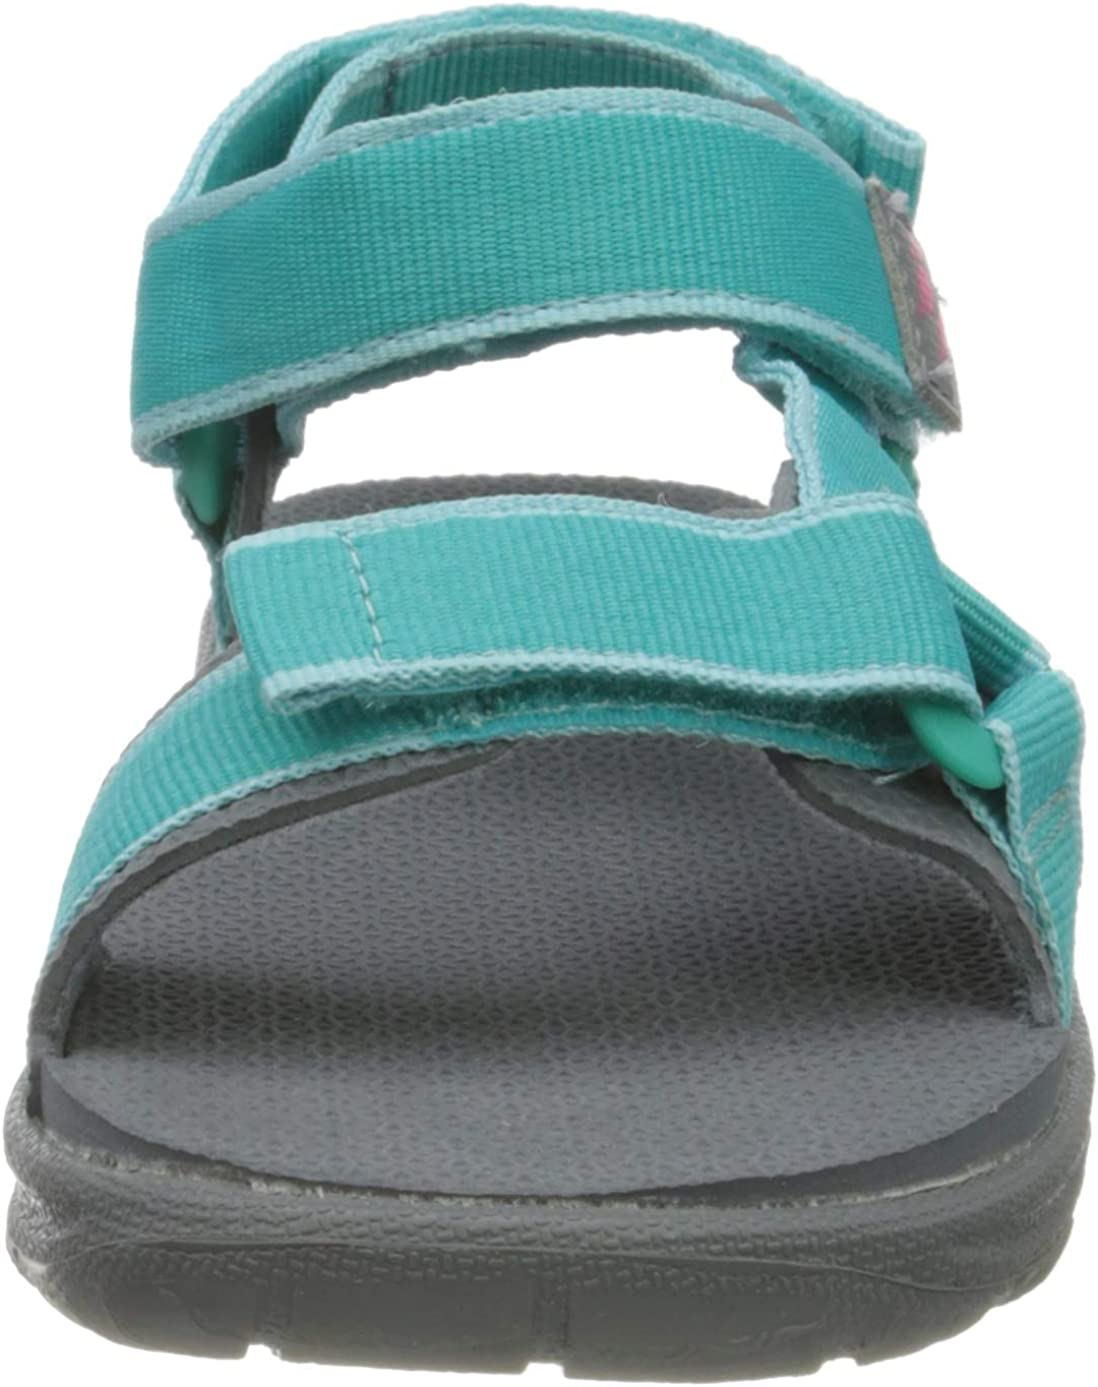 Toddler//Little Kid//Big Kid Jack Wolfskin Kids Girls Seven Seas 2 Sandal